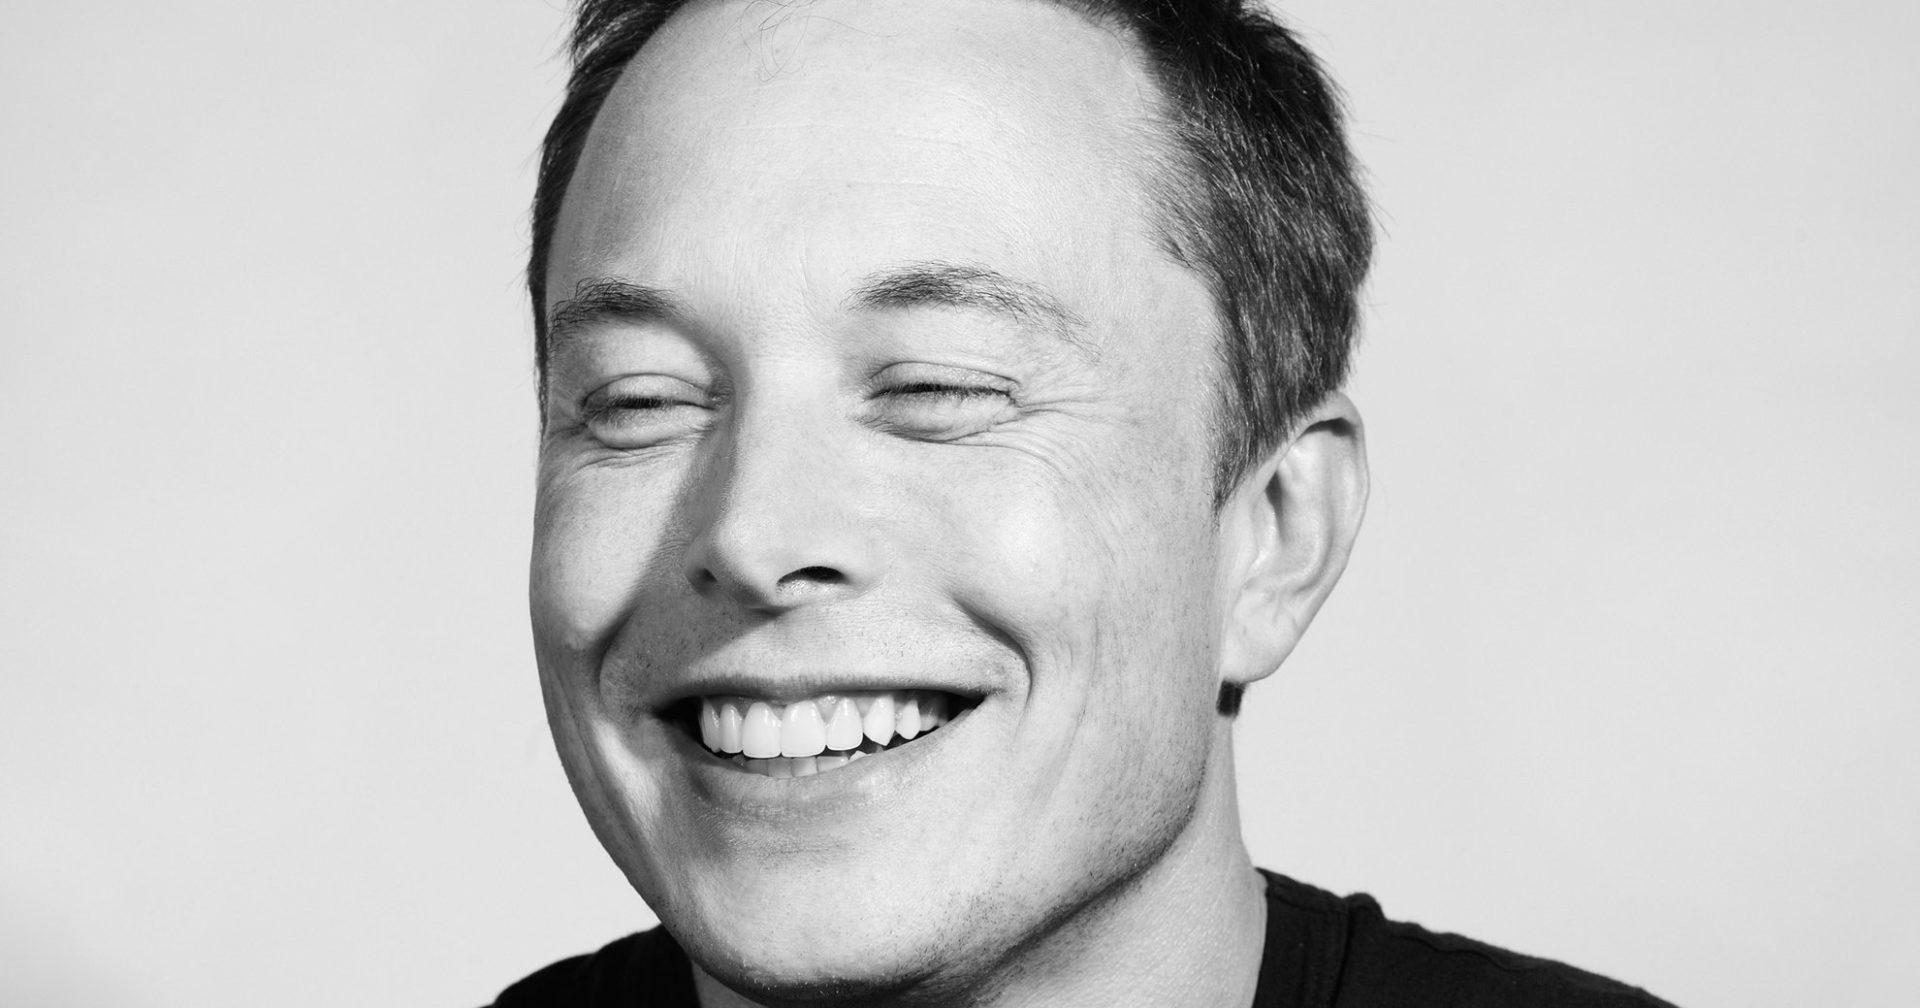 Илон Маск правила жизни